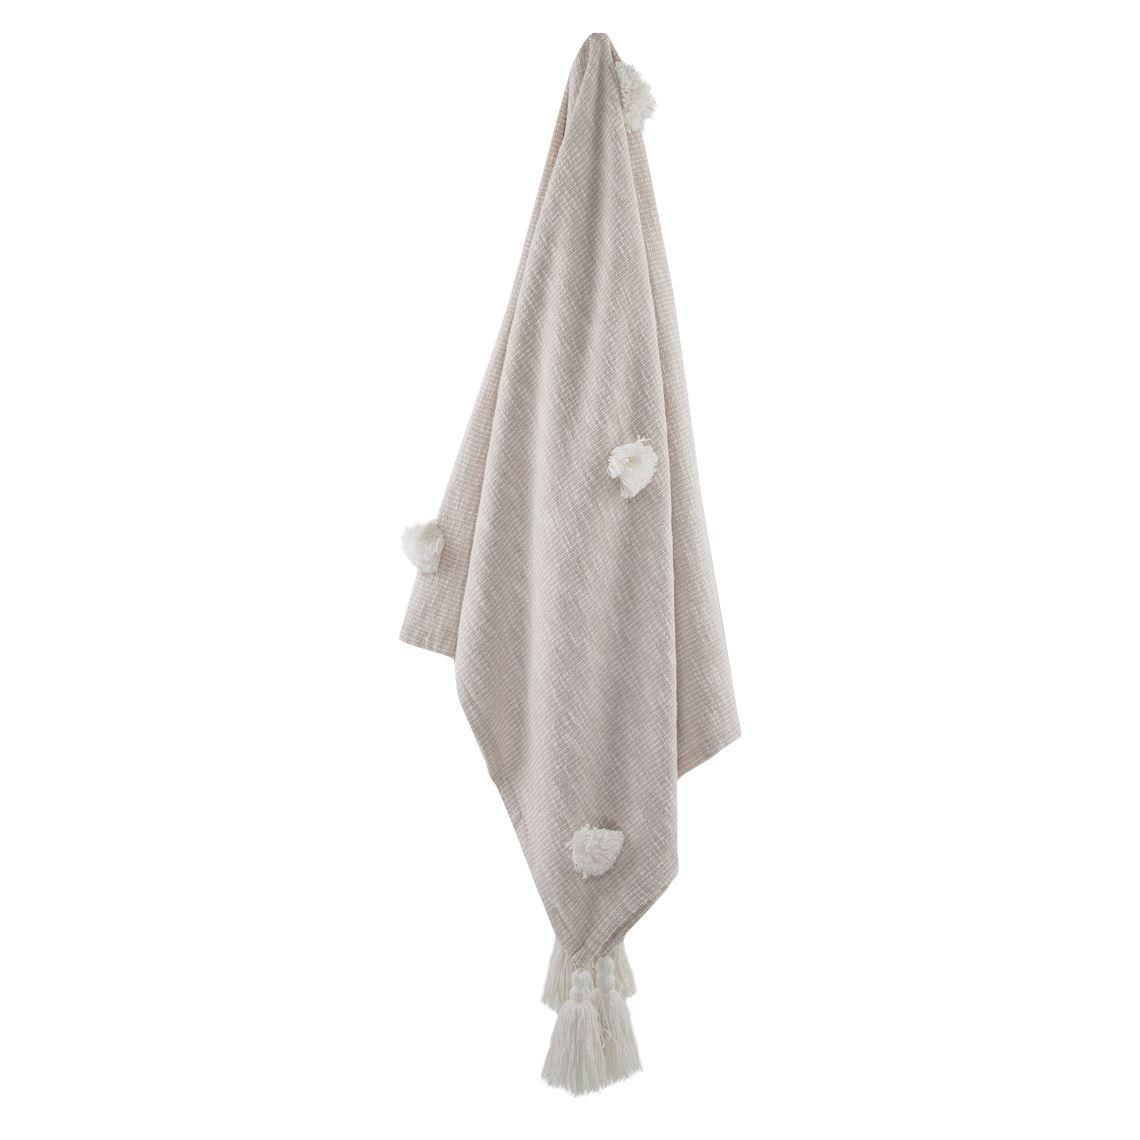 Yuina Throw Size W 130cm x D 170cm x H 2cm in Moonbeam 100% Cotton Freedom